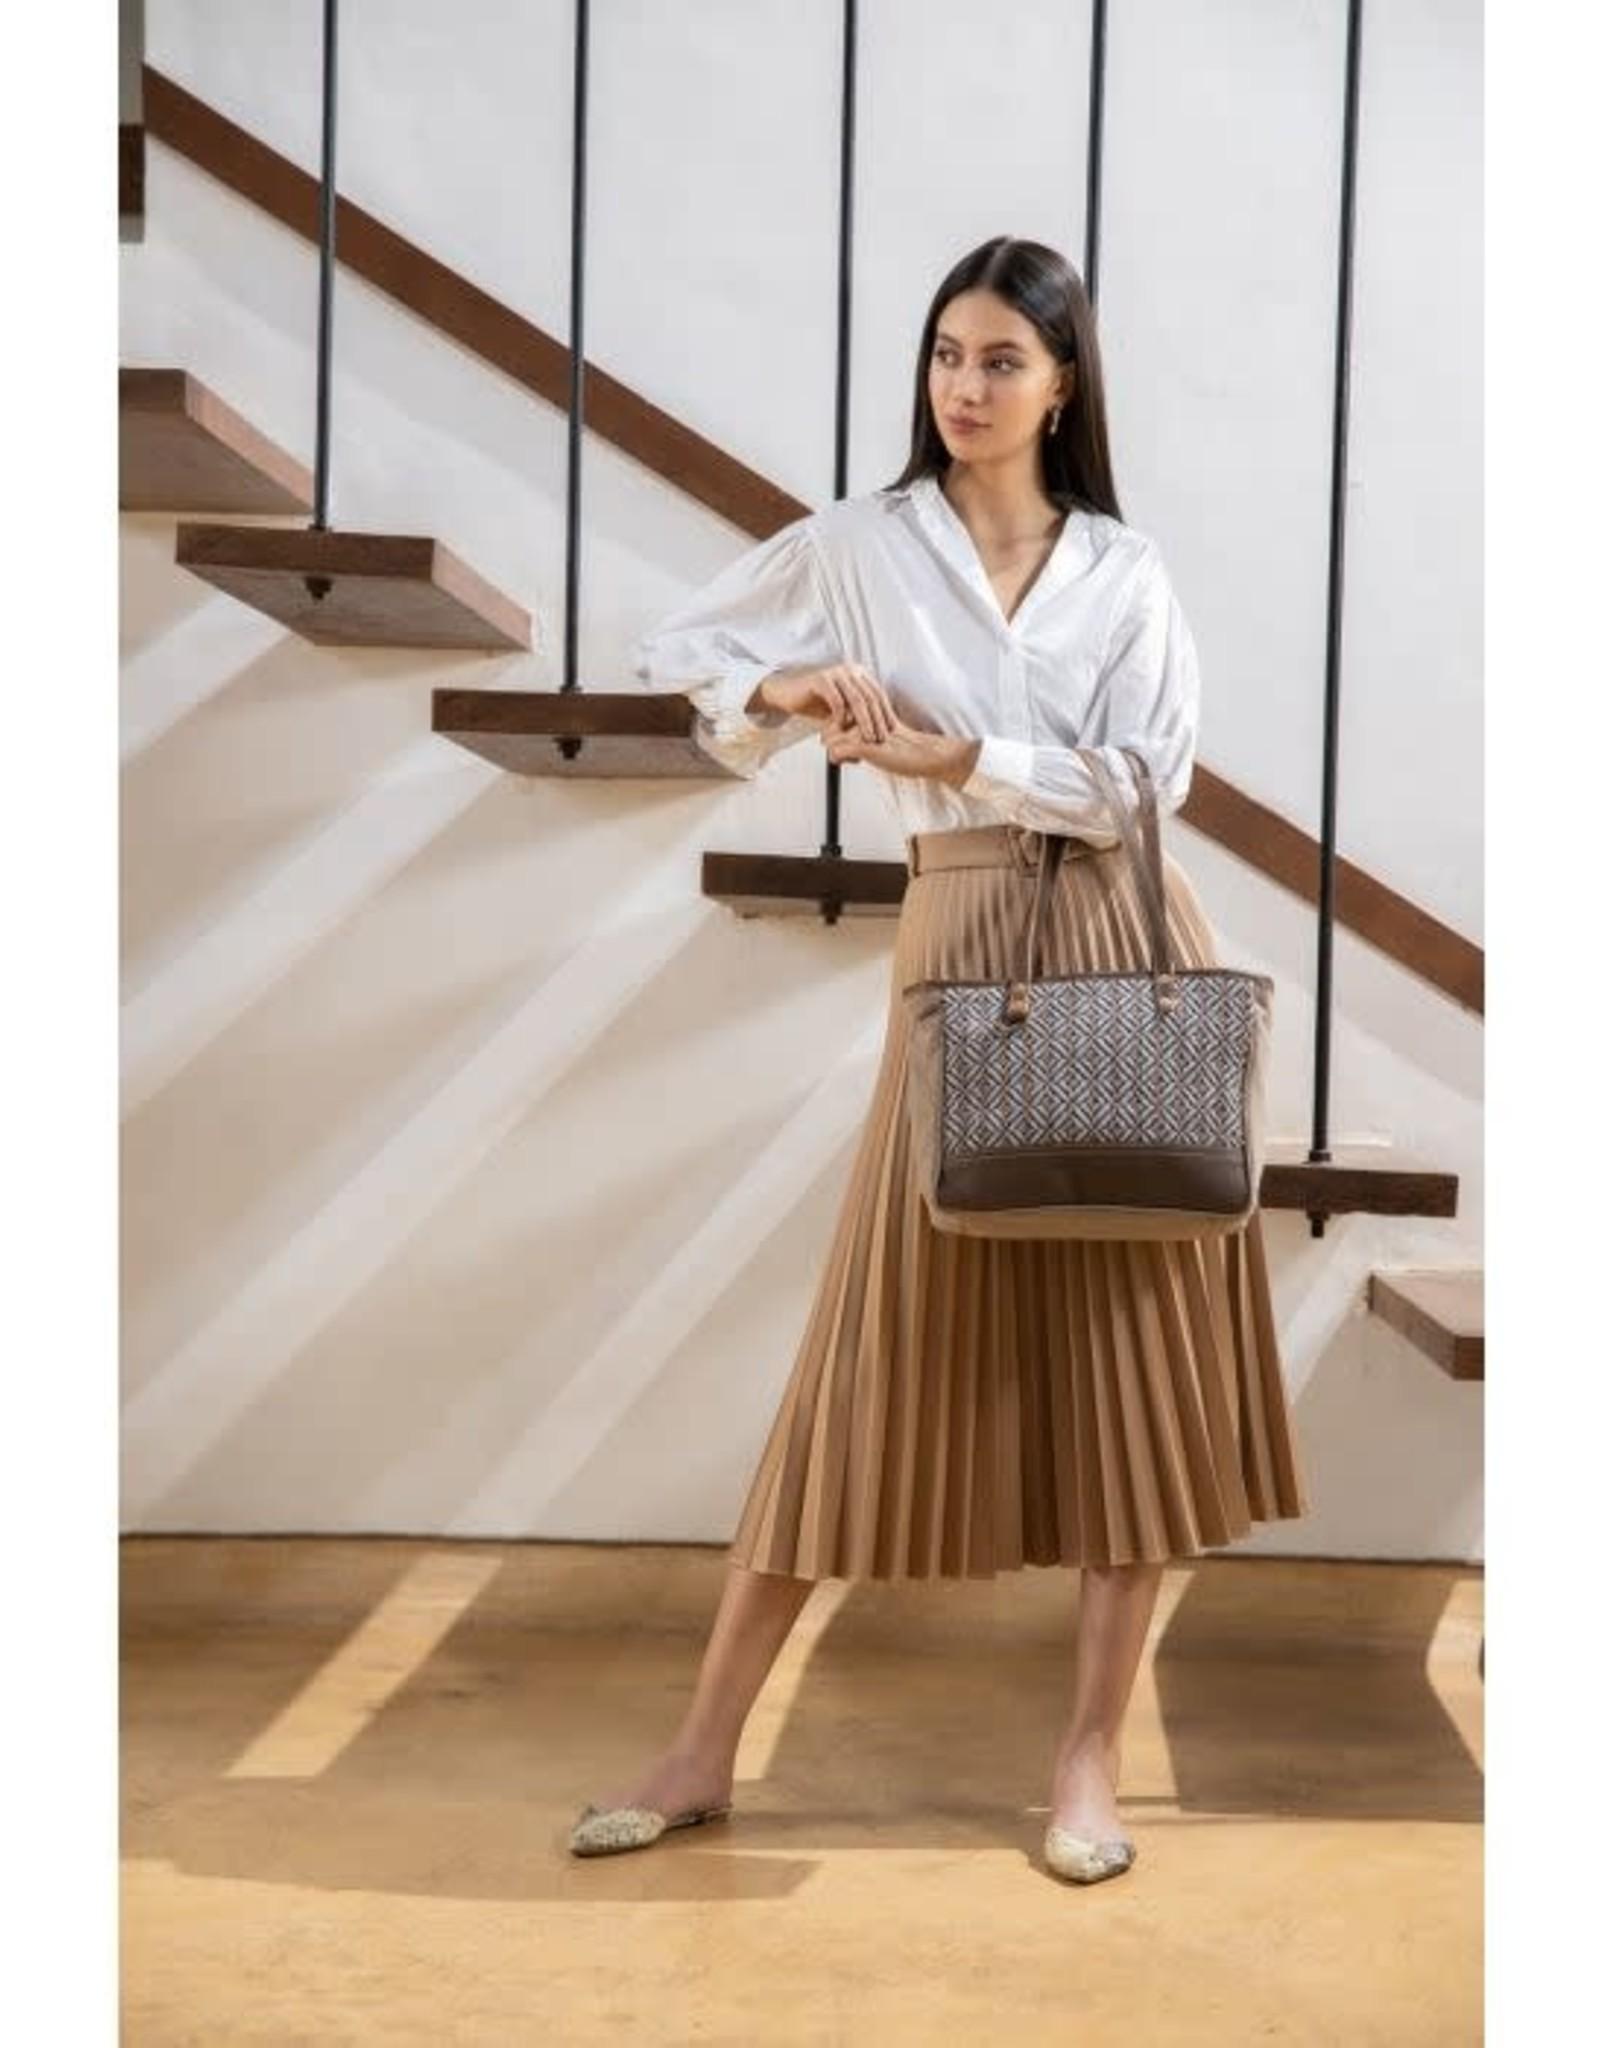 - Boss Lady Small Bag